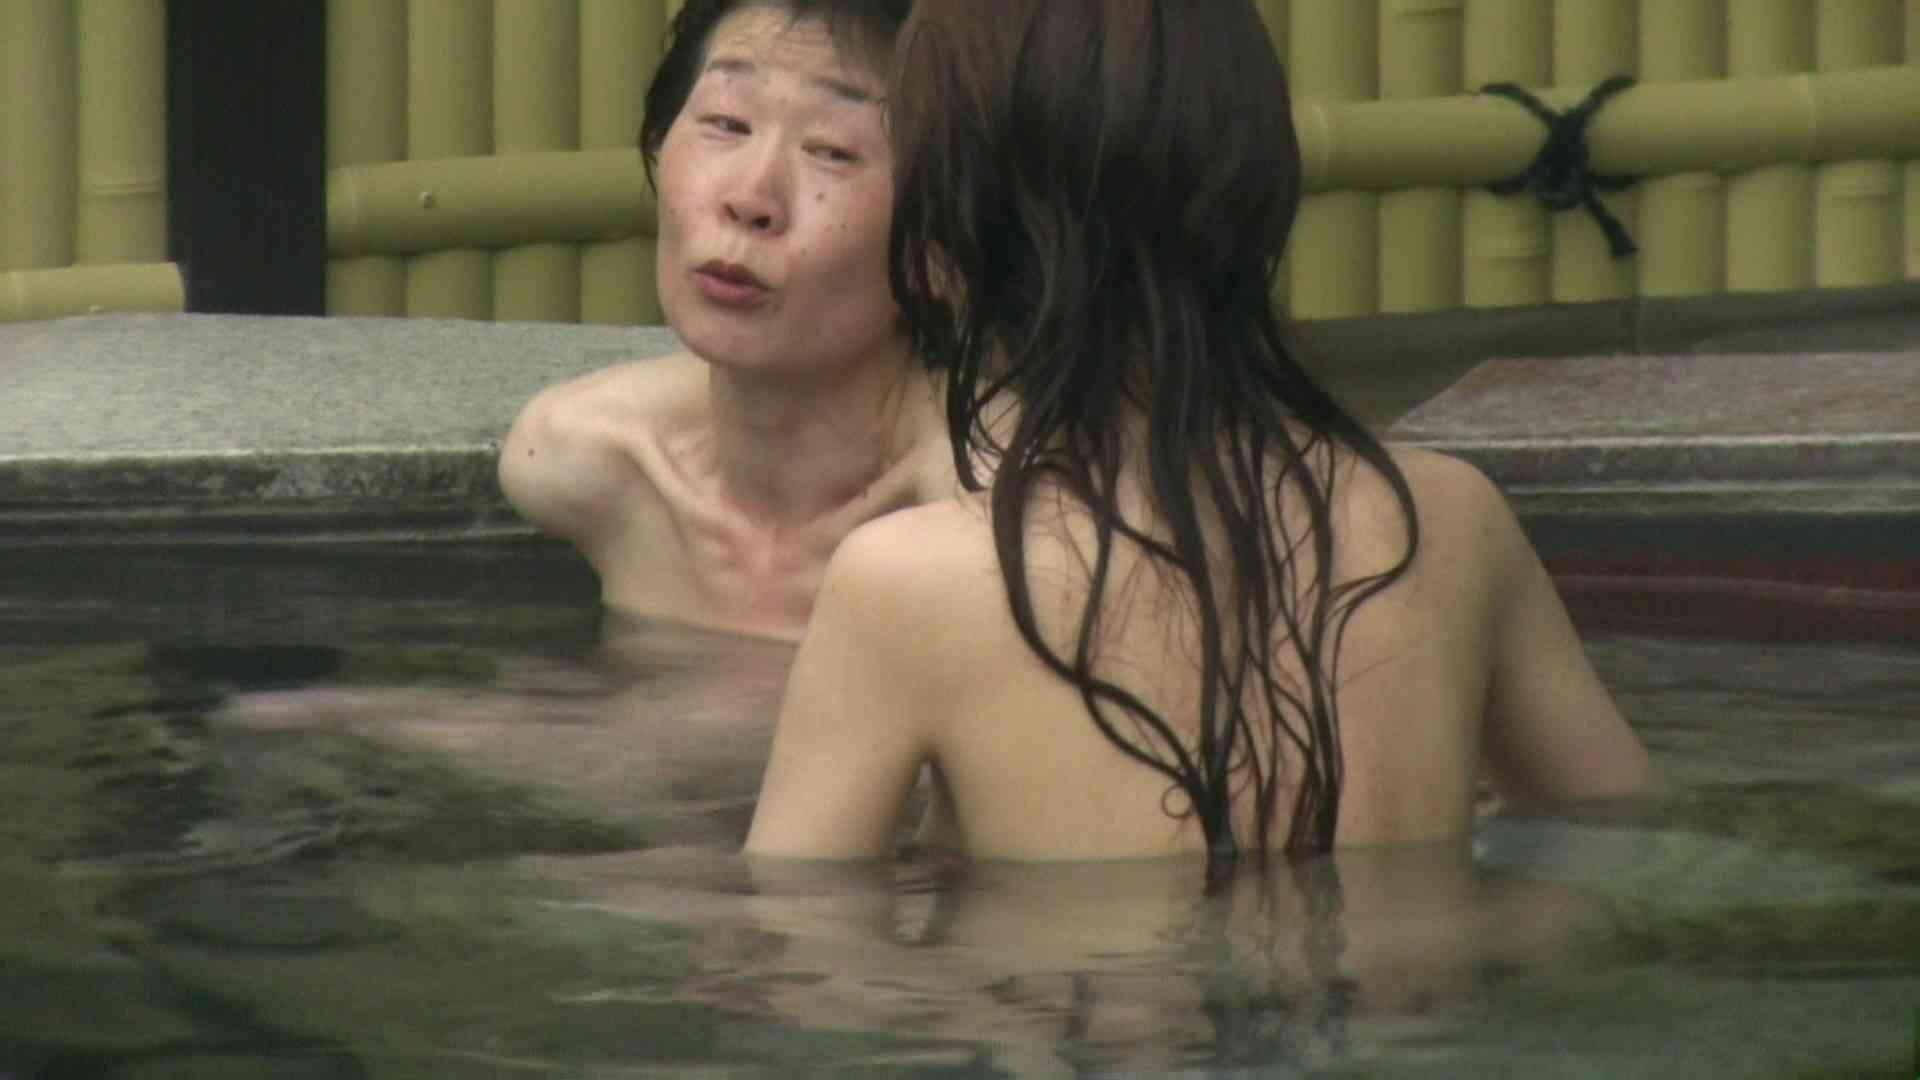 Aquaな露天風呂Vol.07 盗撮シリーズ   露天風呂編  94PIX 13